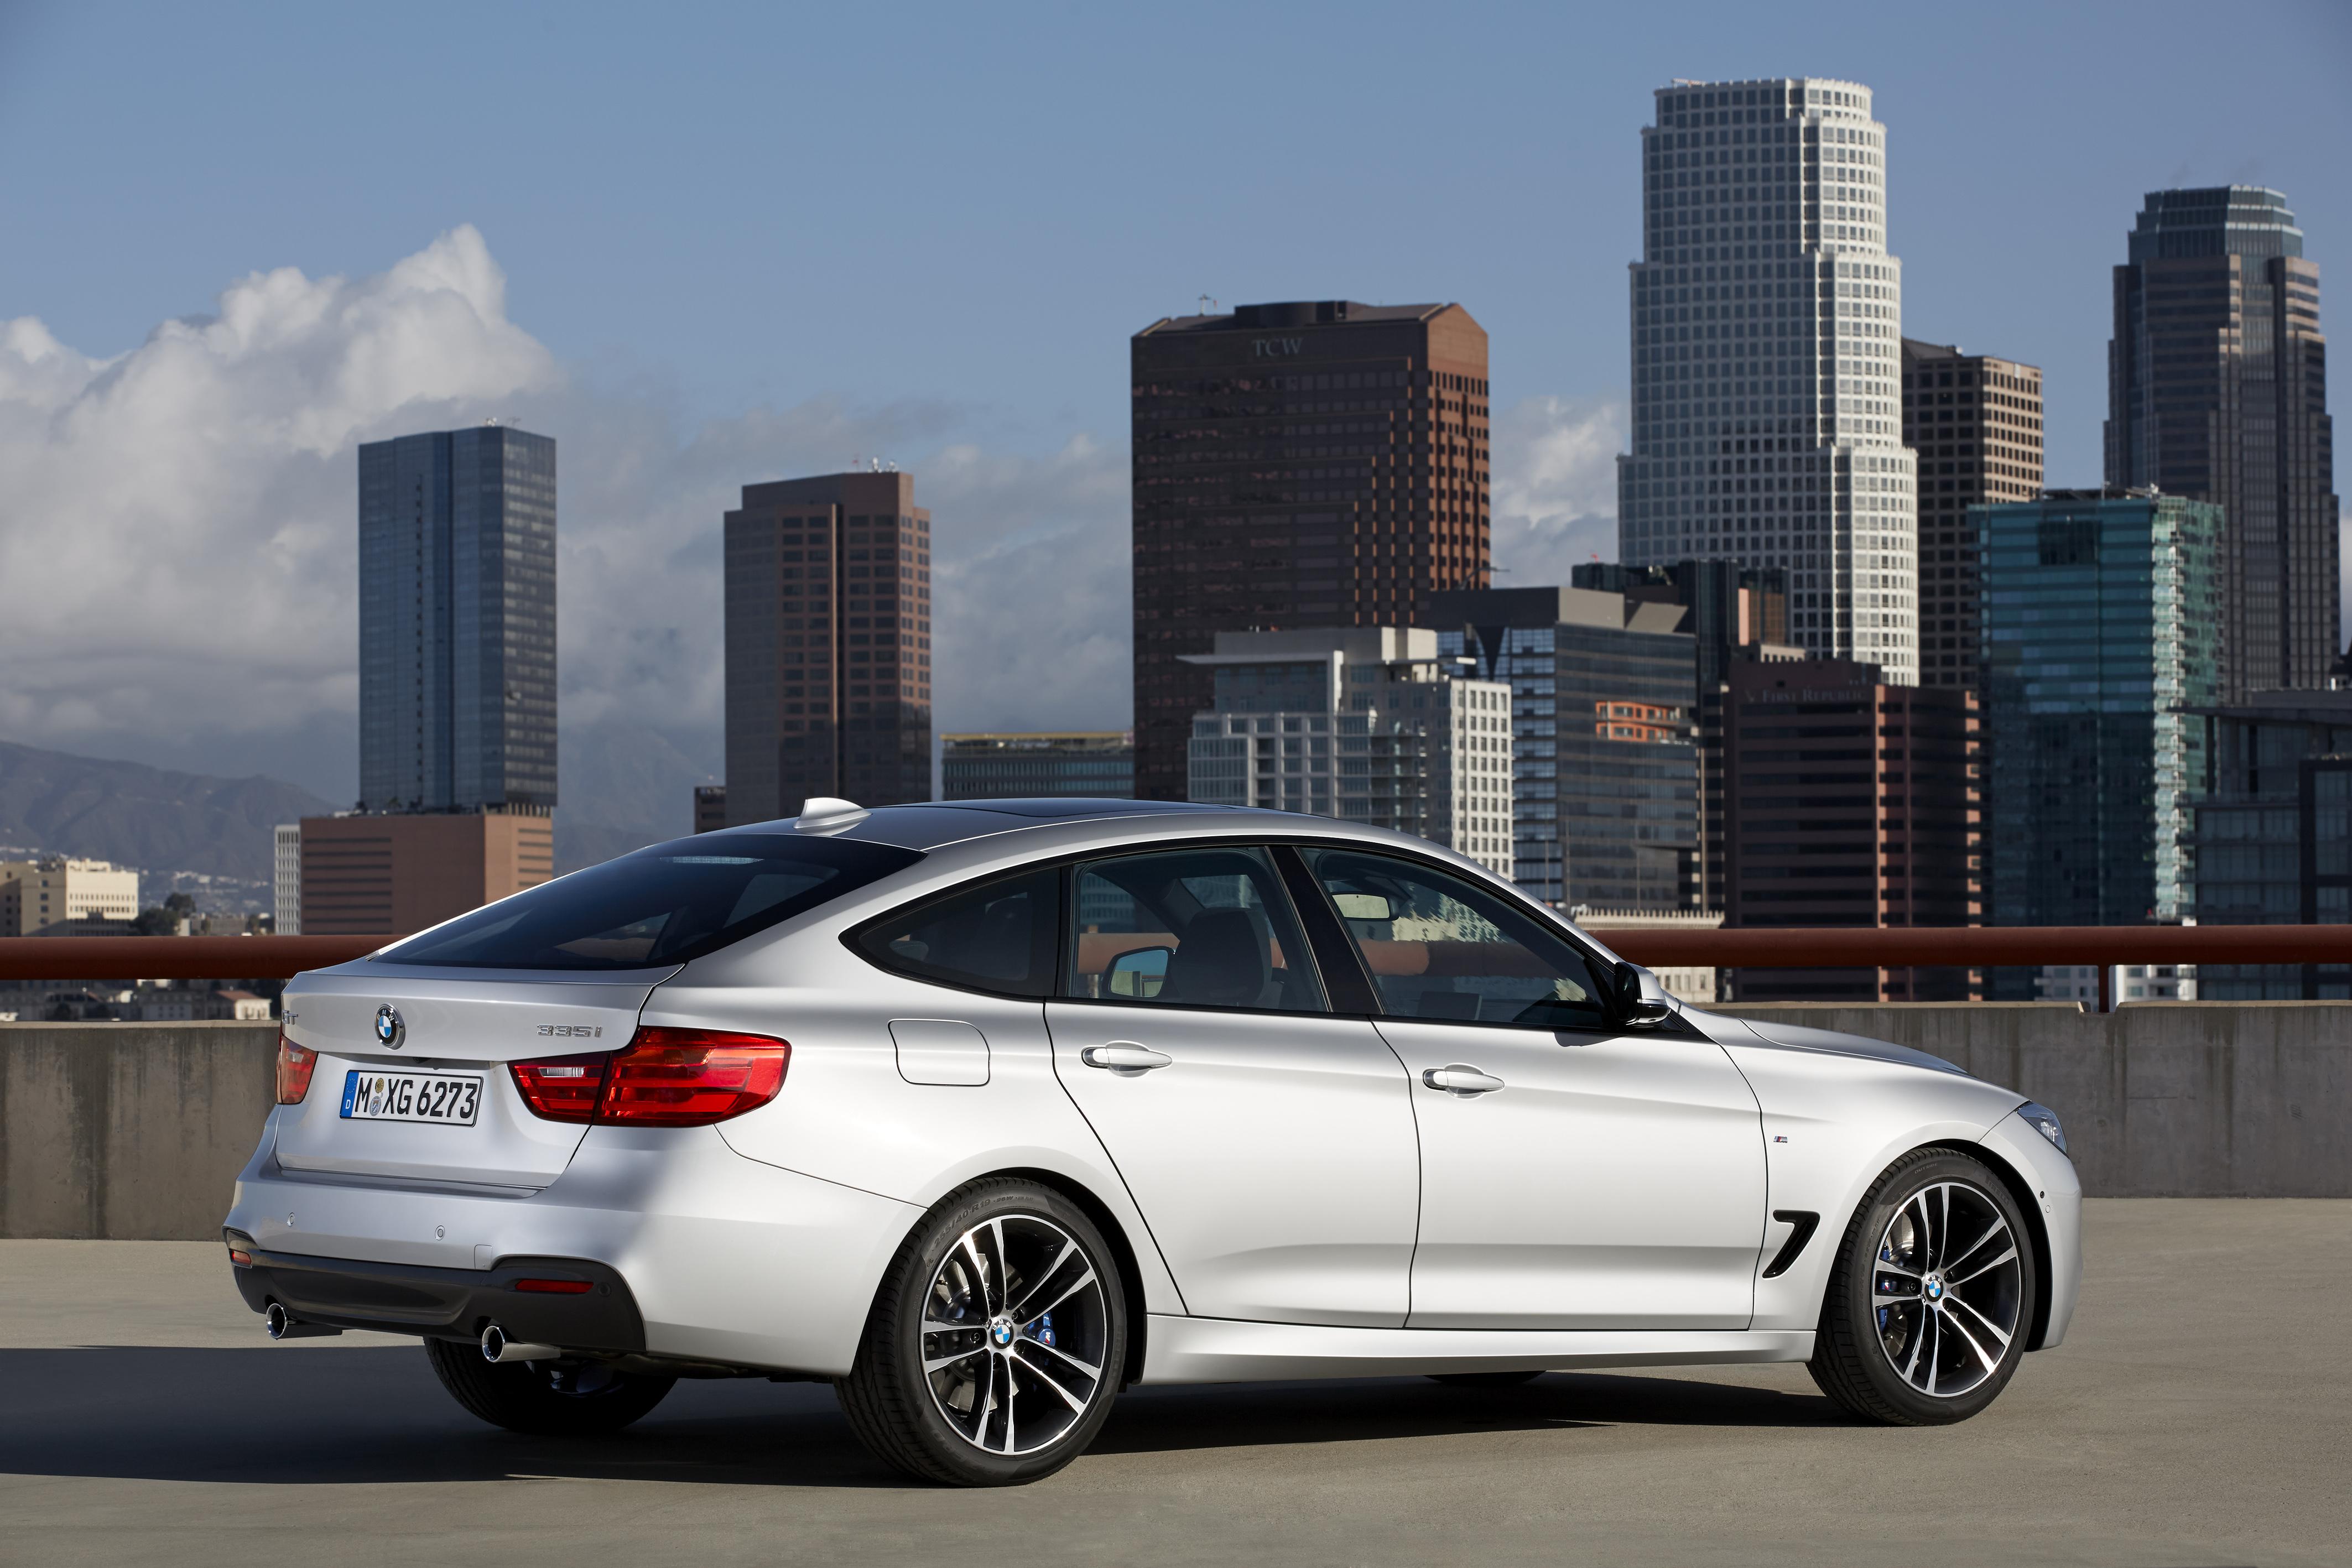 BMW Series GT Hurls Into View BMW Car Club Of America - Bmw 325i gt